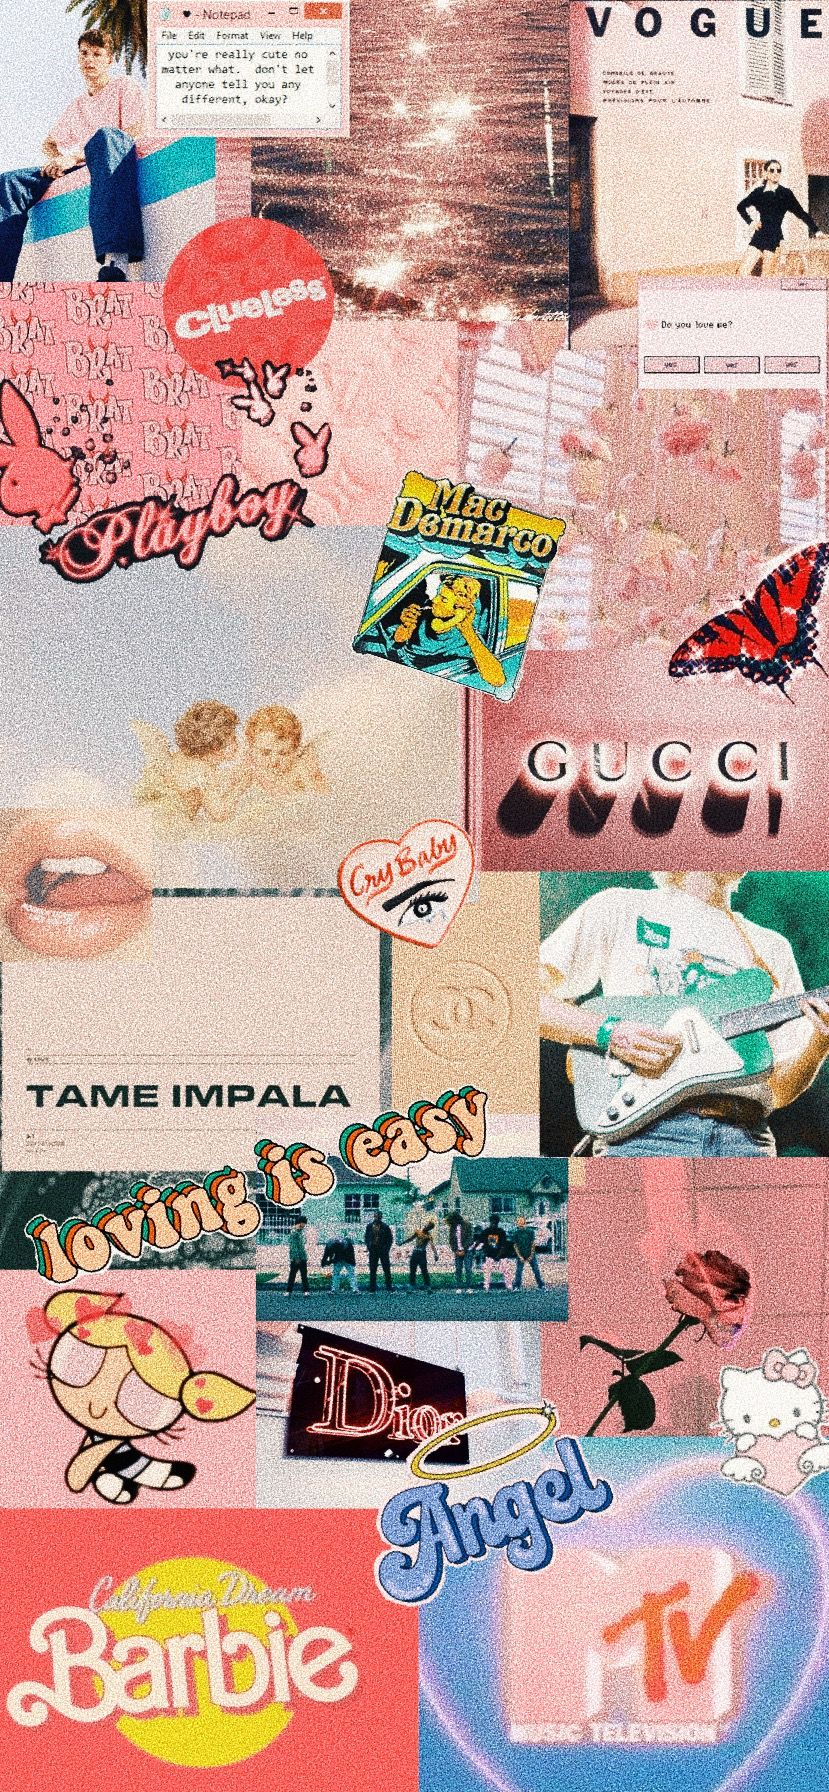 Retro Vintage Aesthetic Collage Wallpaper Iphone X Xr Xs Iphone 10 11 Pink Y2k 90s Rex Orange In 2020 Pink Wallpaper Iphone Aesthetic Iphone Wallpaper Kitty Wallpaper